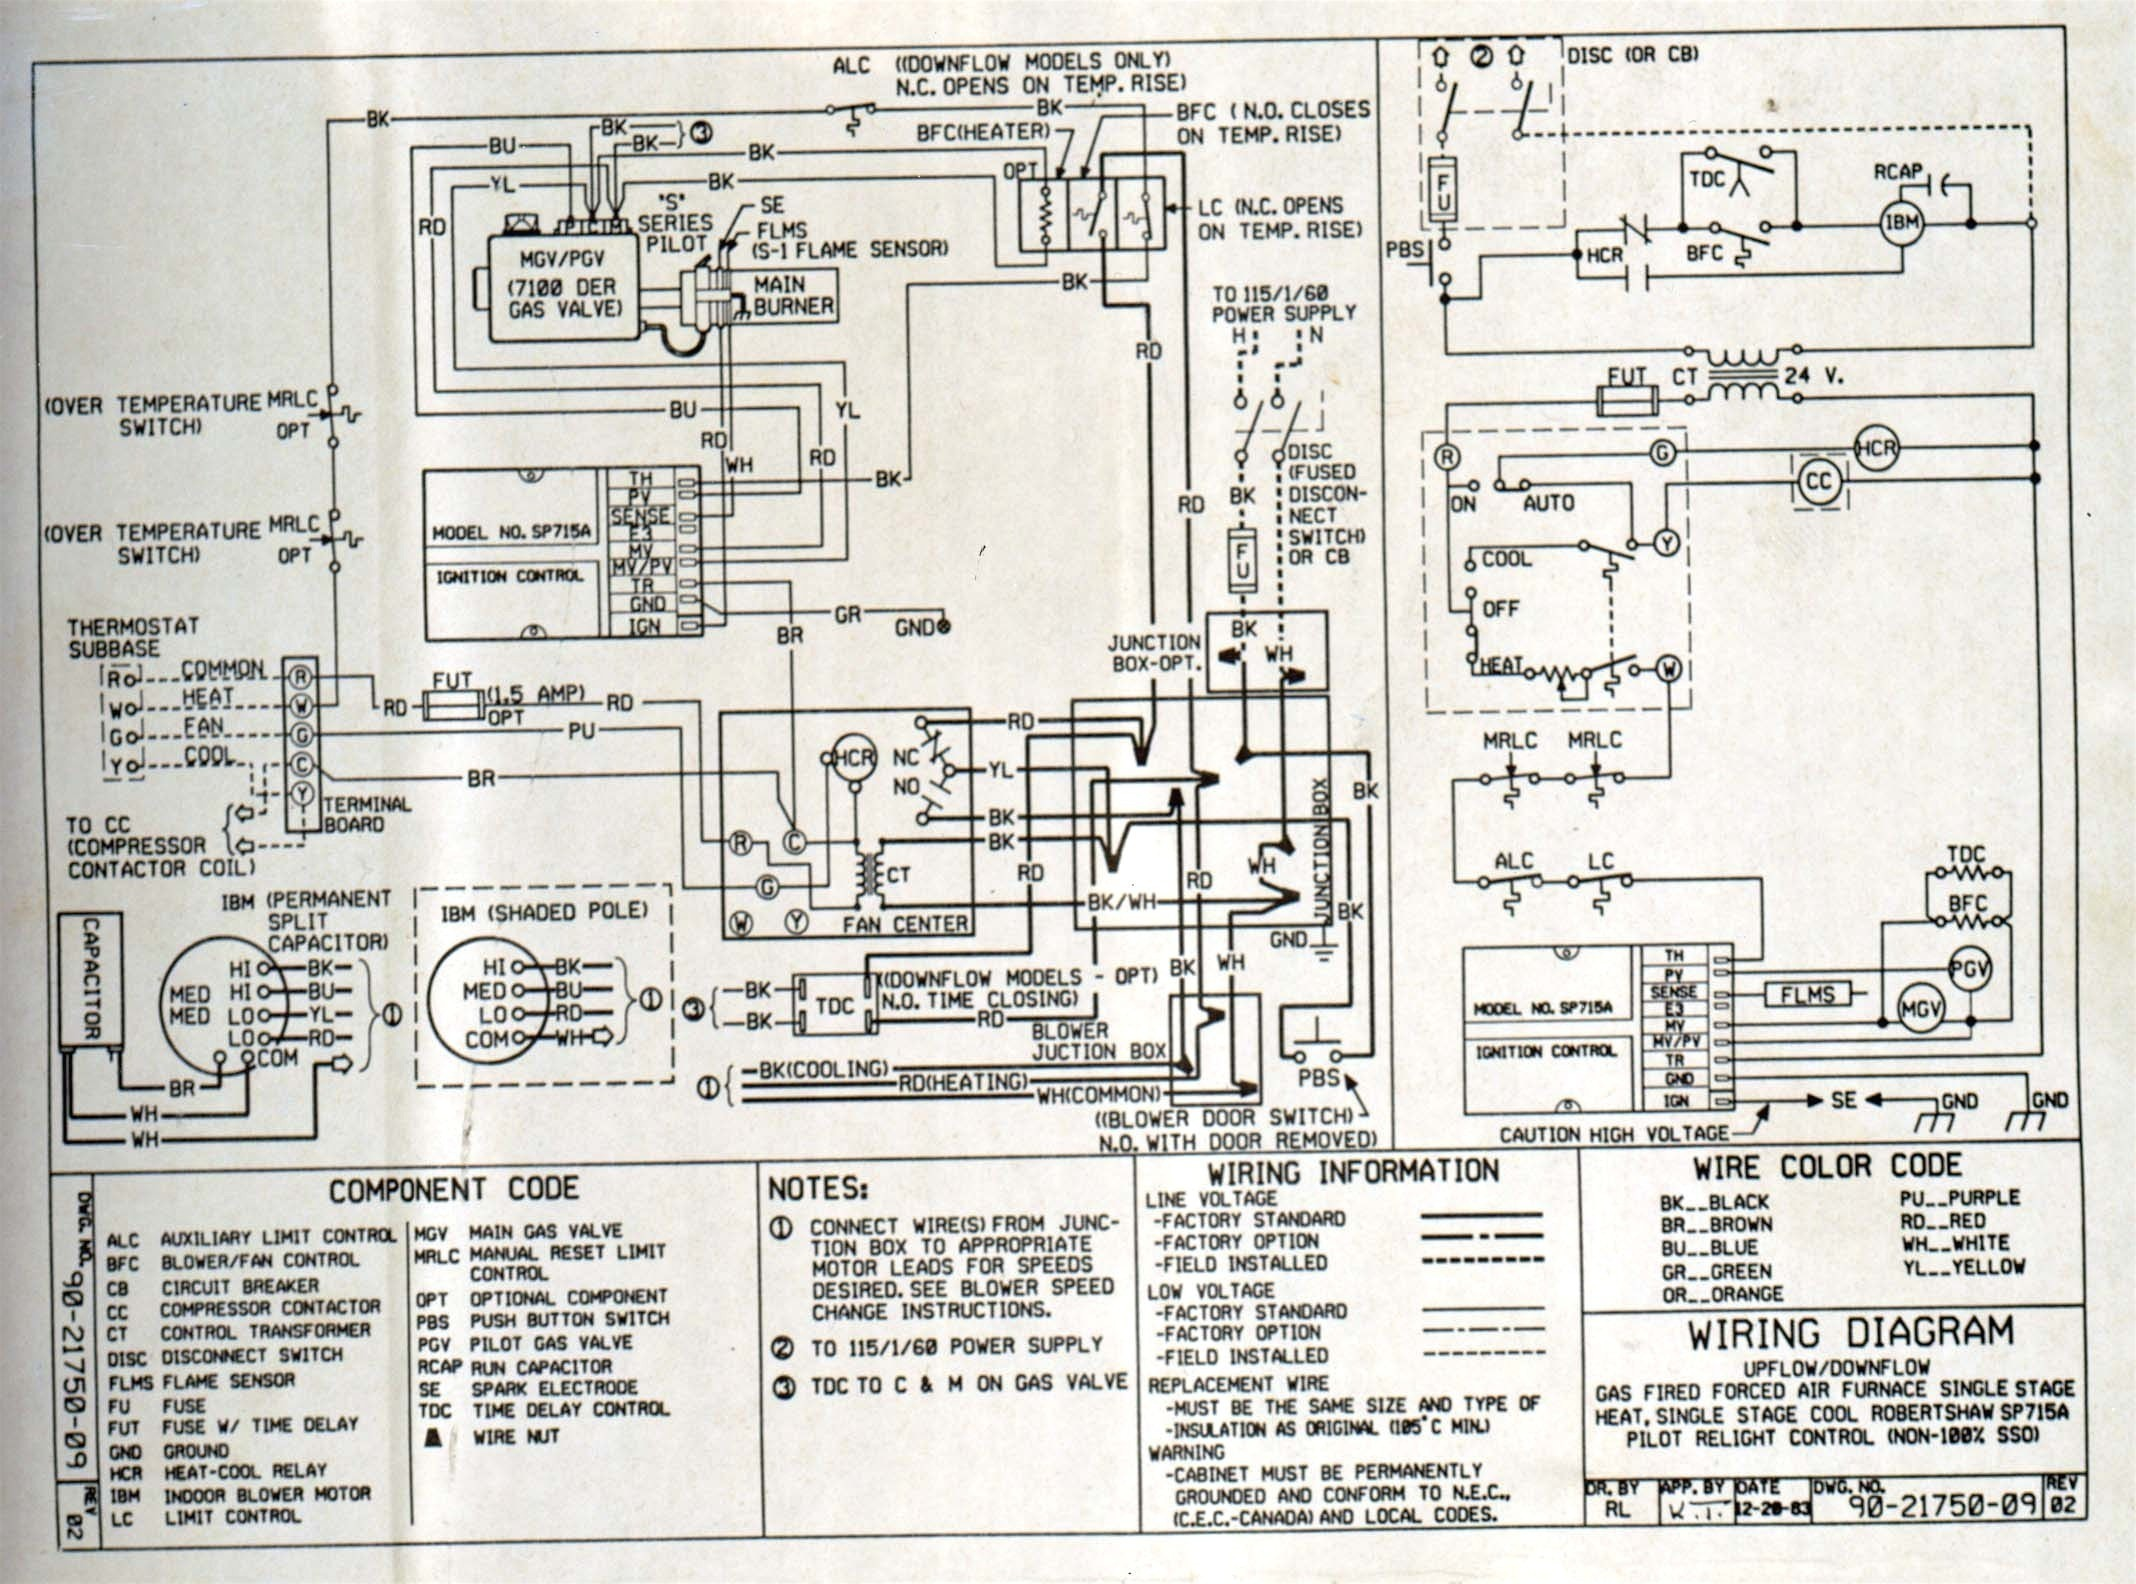 General Electric Motor Wiring Diagram 2 Ge Gas Furnace ... on